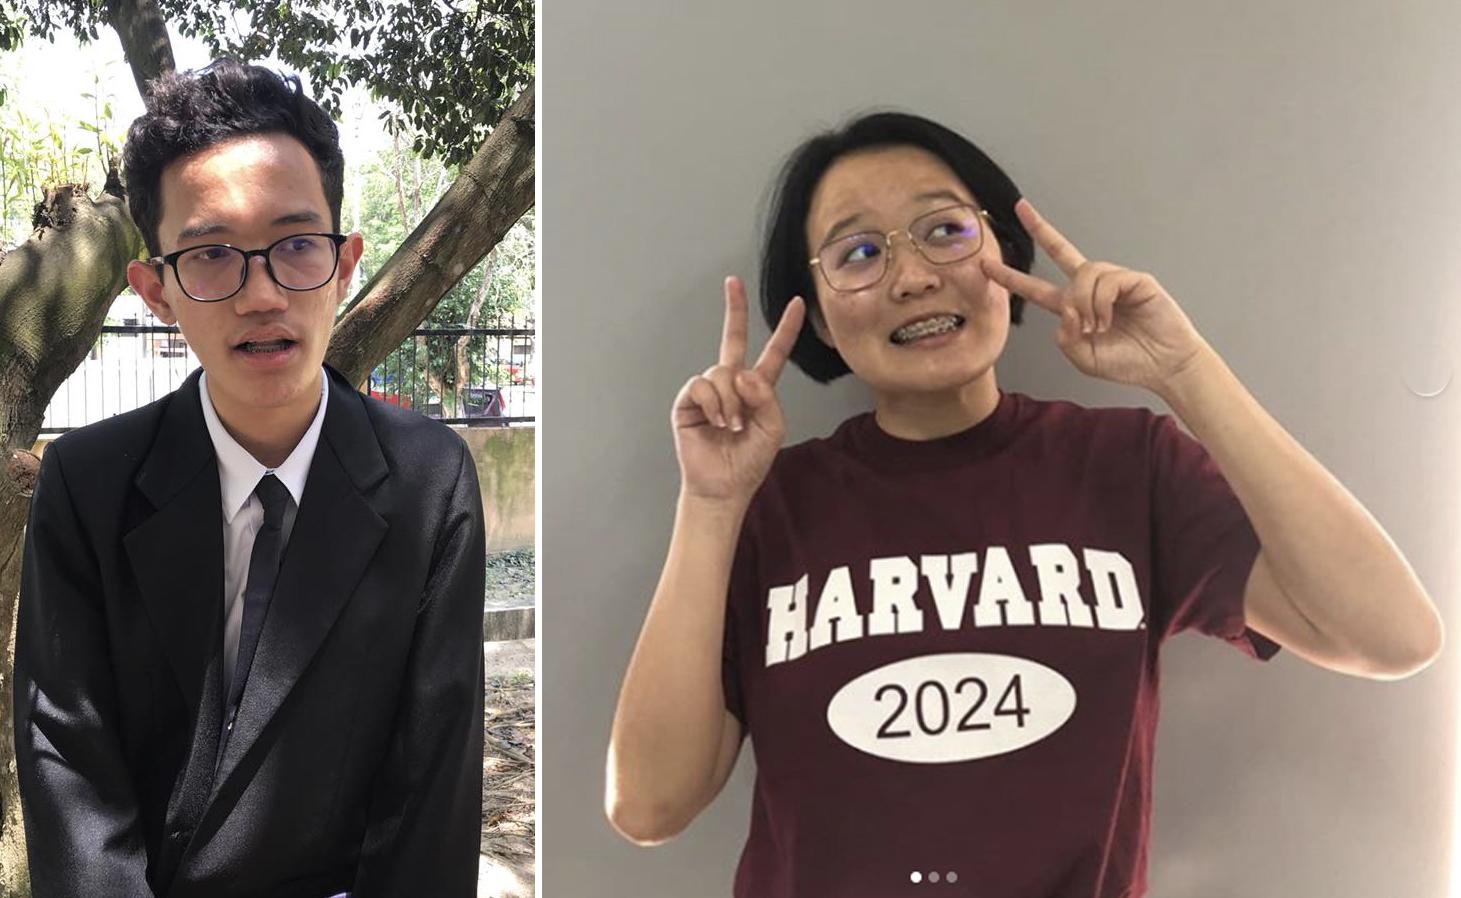 Congratulations, both of you.